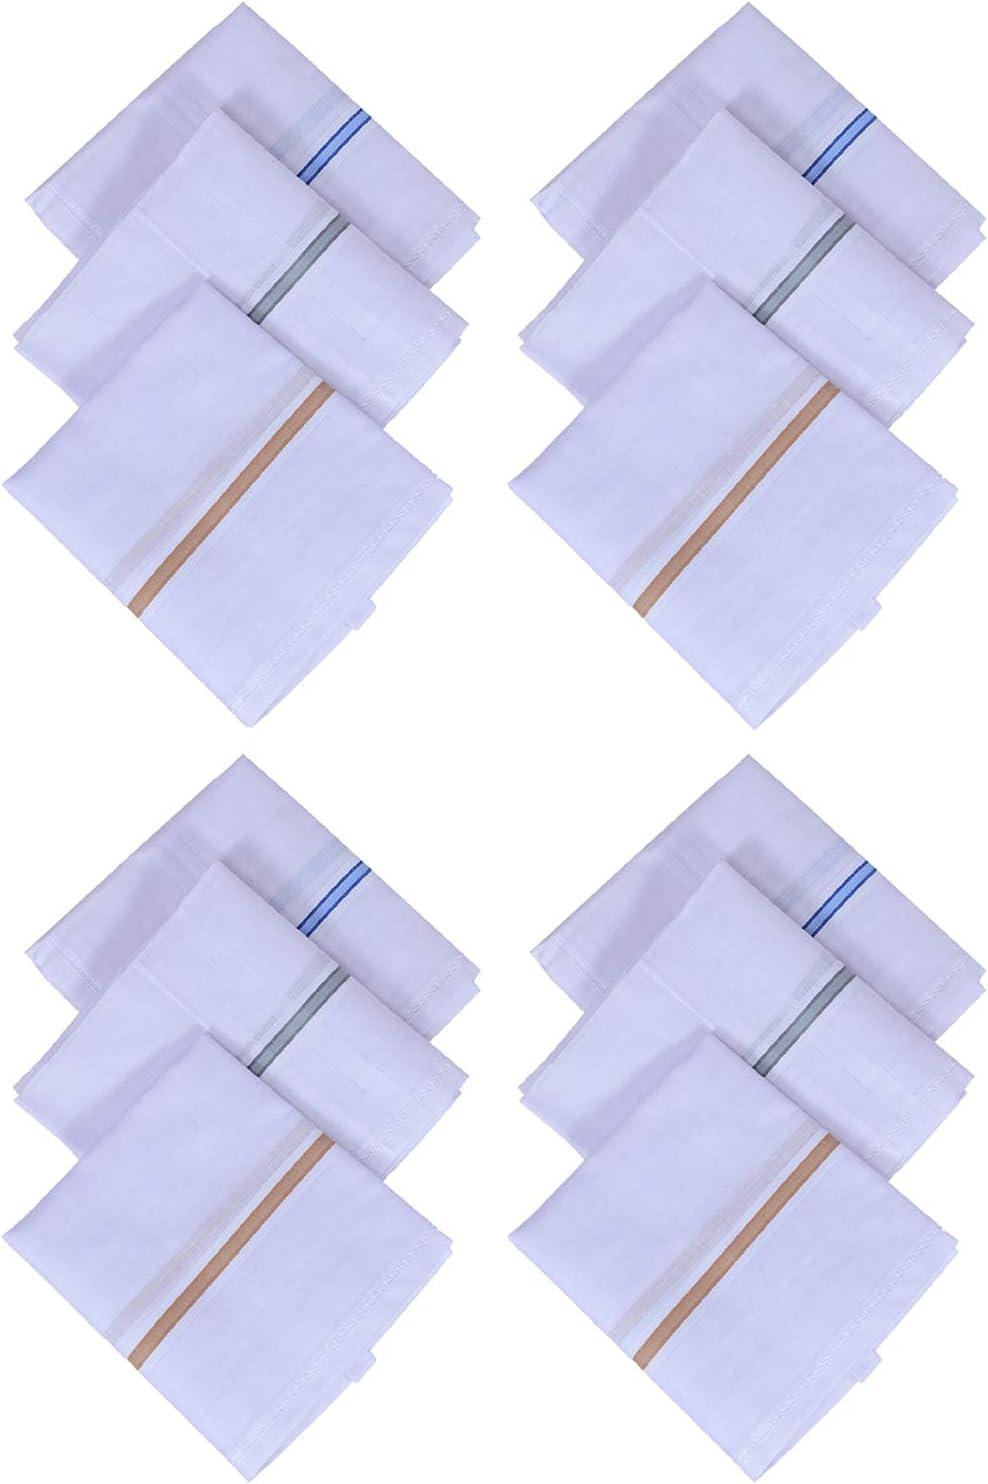 Kuber Industries Cotton 12 Piece Men's Handkerchief Set - White (CTKTC05635)